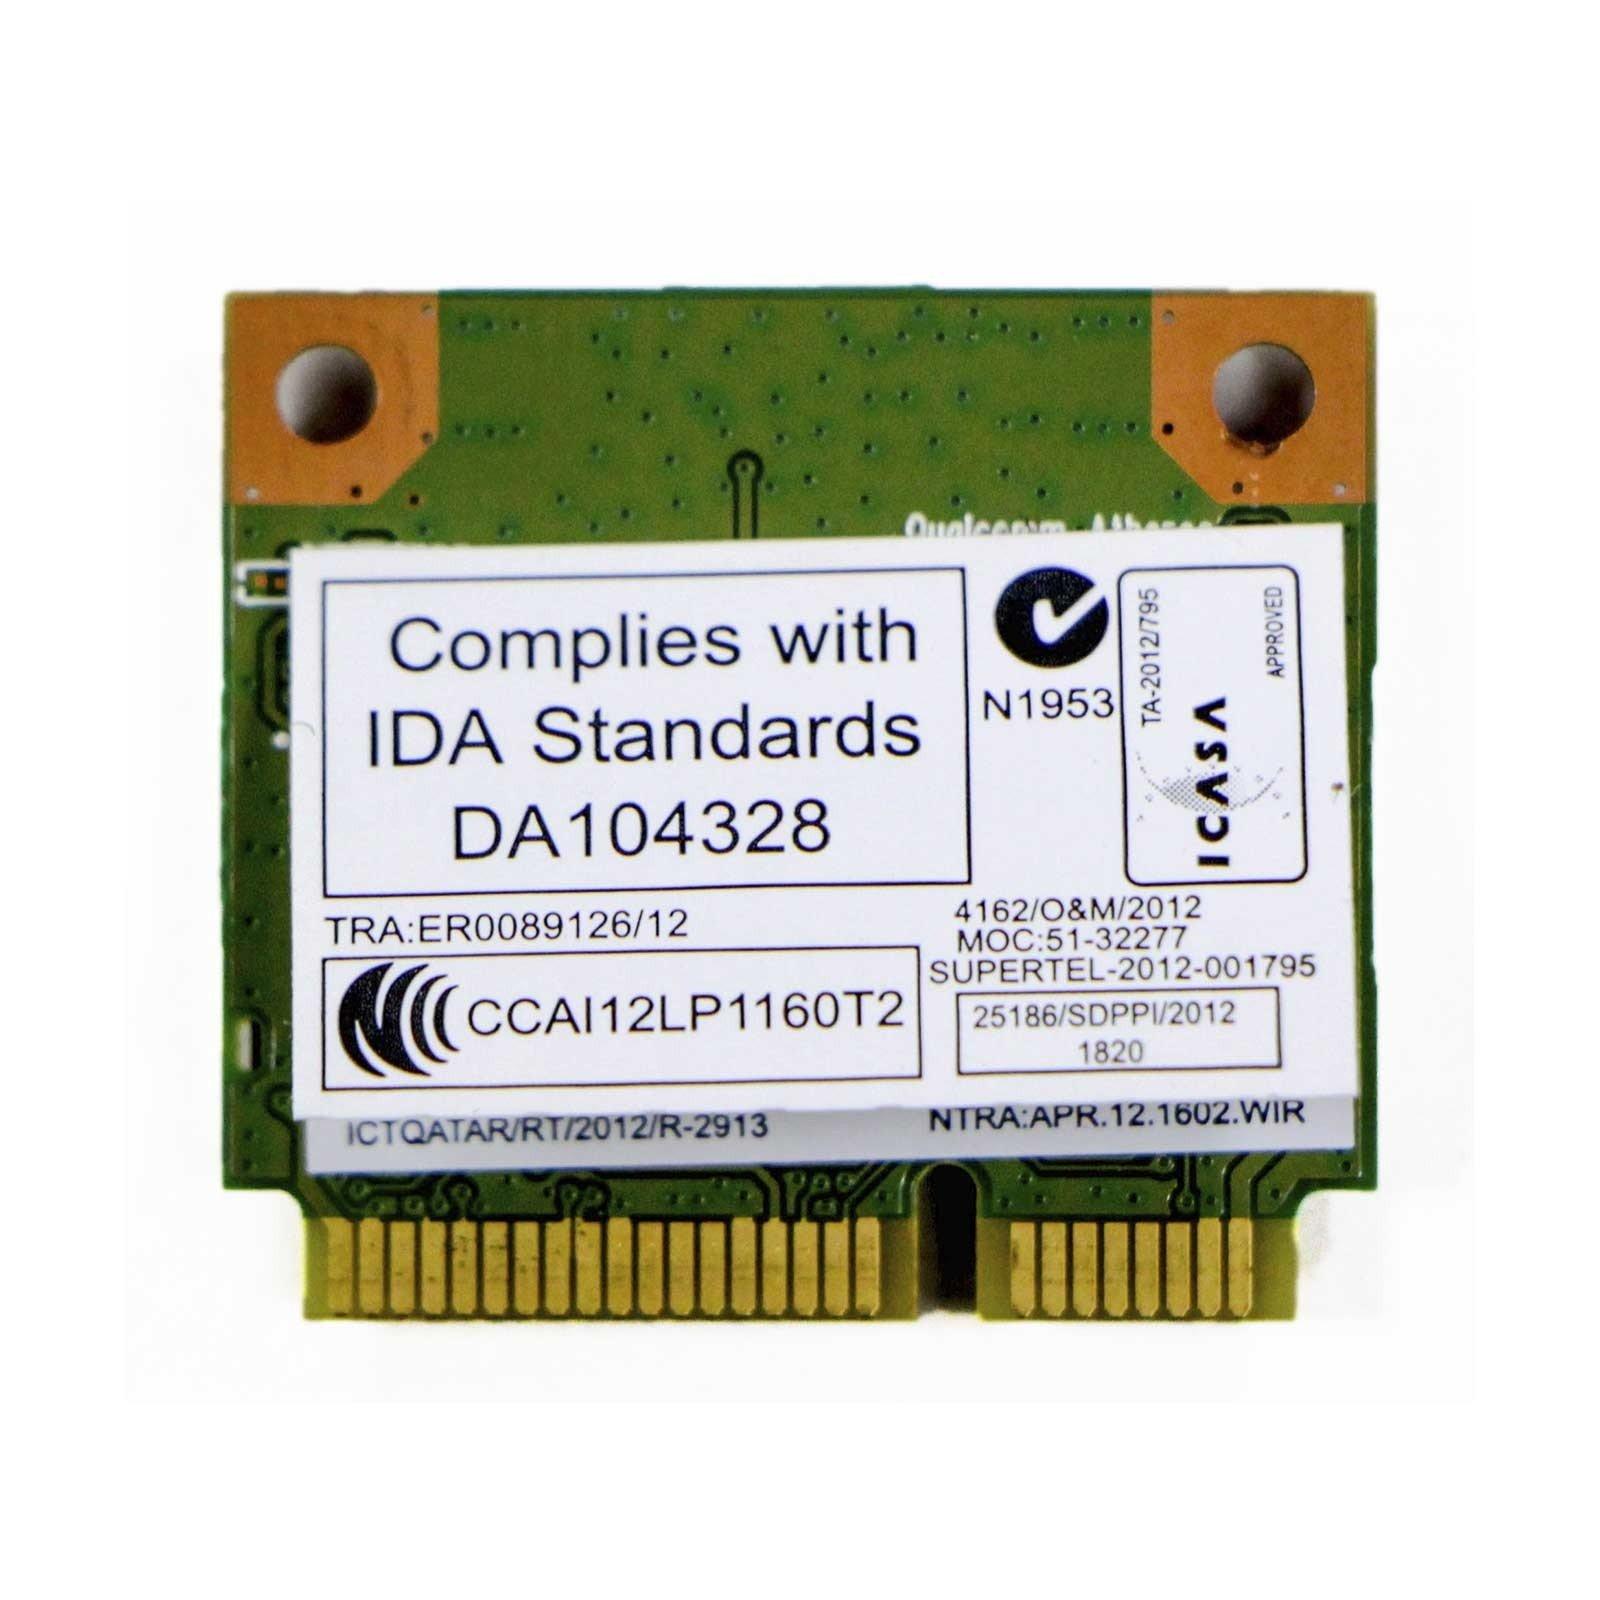 Qualcomm / Atheros Replacement for HP Laptop AR9565 Half Mini PCIe WLAN WIFI Wireless BT Bluetooth Card (B00TN7BI2U) Amazon Price History, Amazon Price Tracker